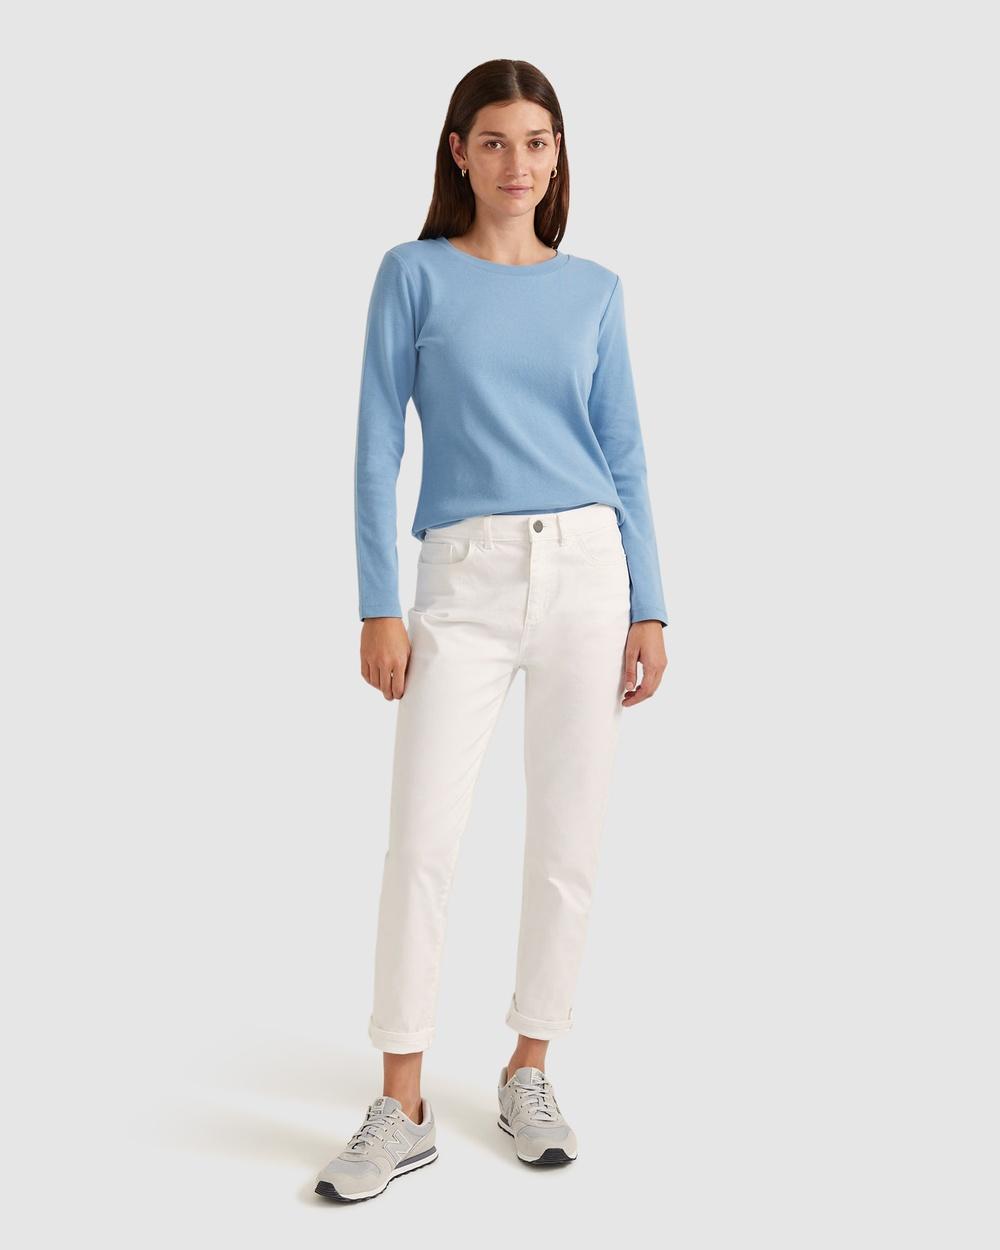 Sportscraft - Organic Cotton Long Sleeve Tee - Tops (Blue) Organic Cotton Long Sleeve Tee